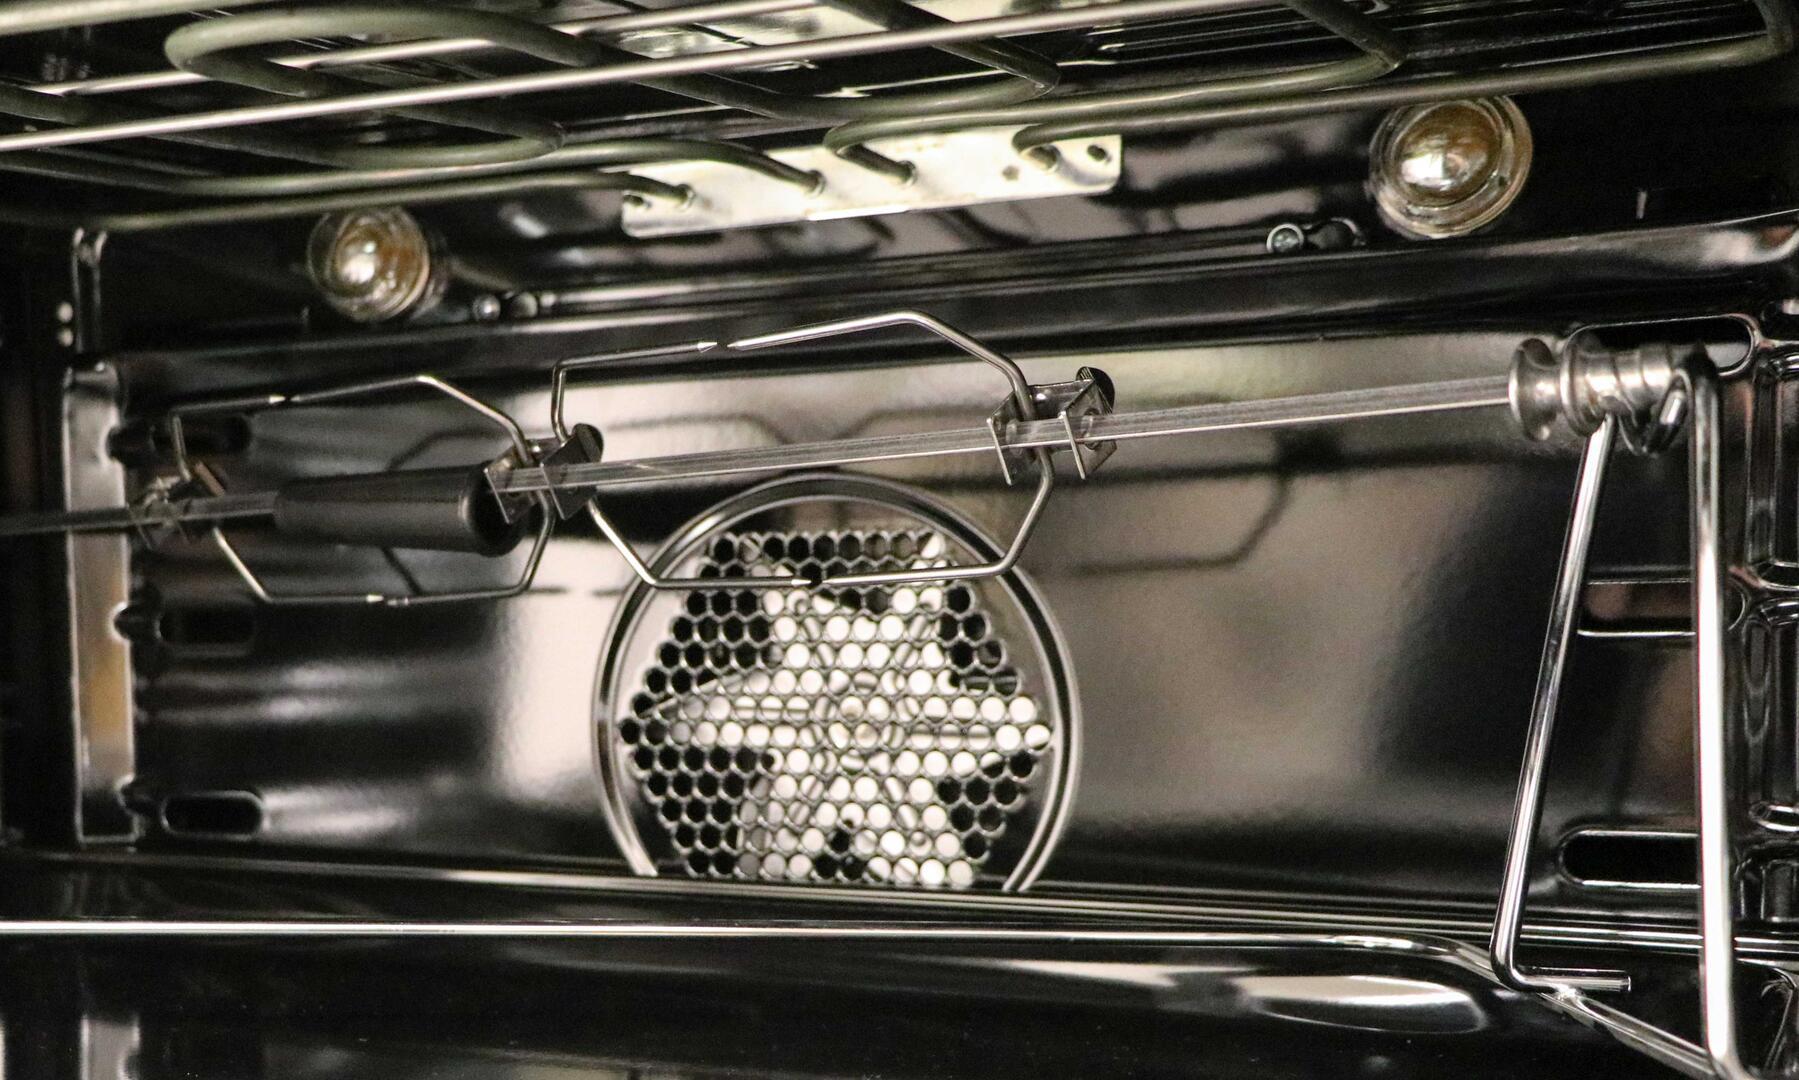 Ilve Nostalgie UPDN100FDMPNLP Freestanding Dual Fuel Range Black, Main Oven Rotisserie